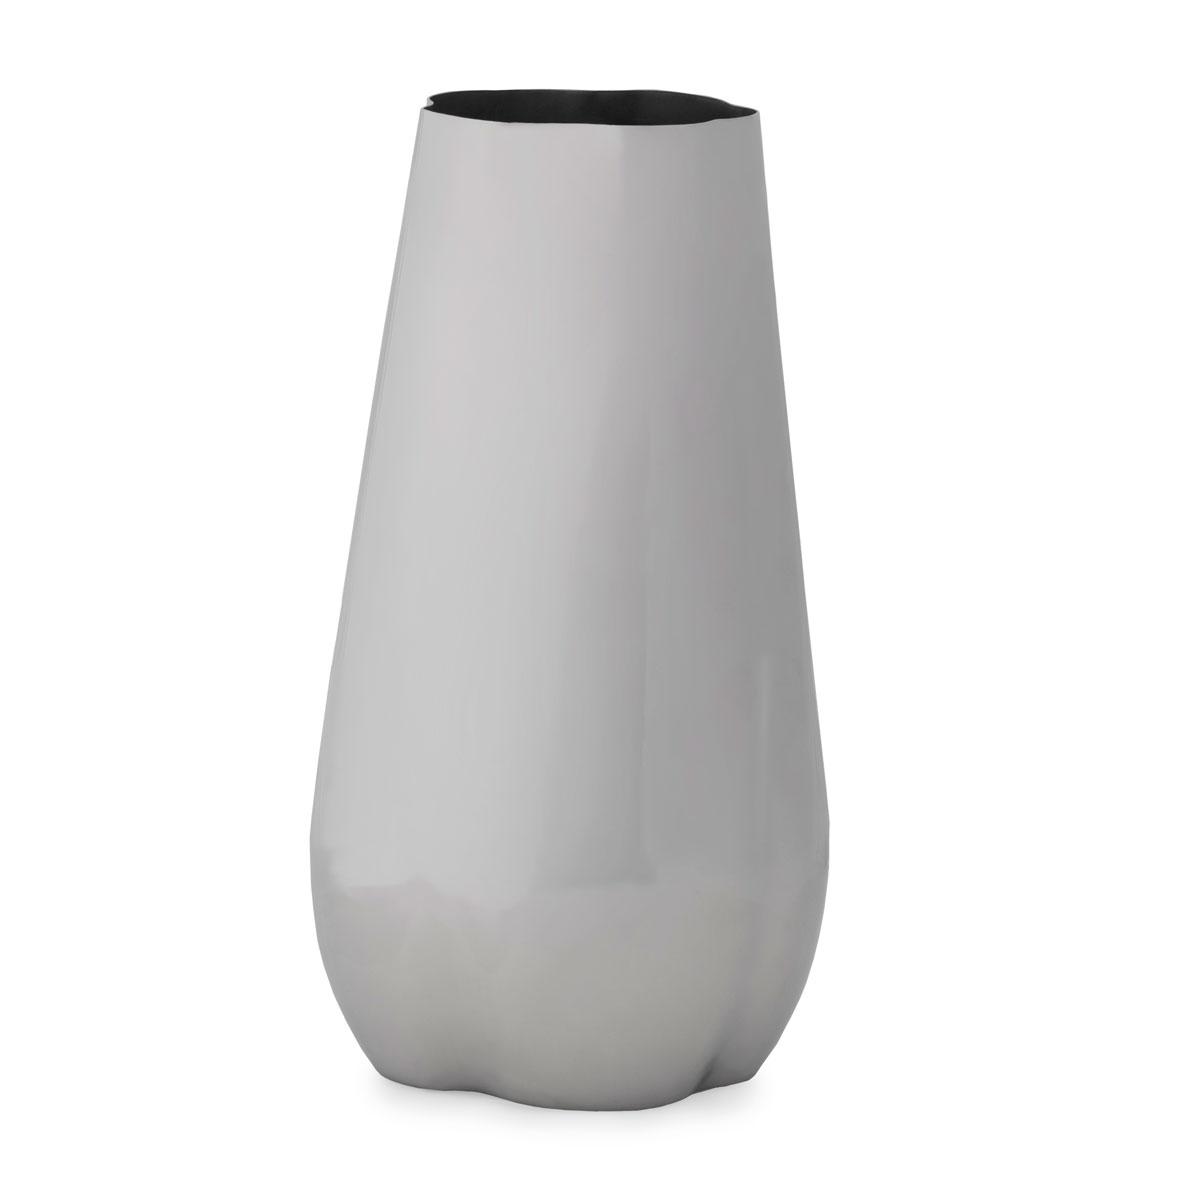 Michael Aram Pod Vase